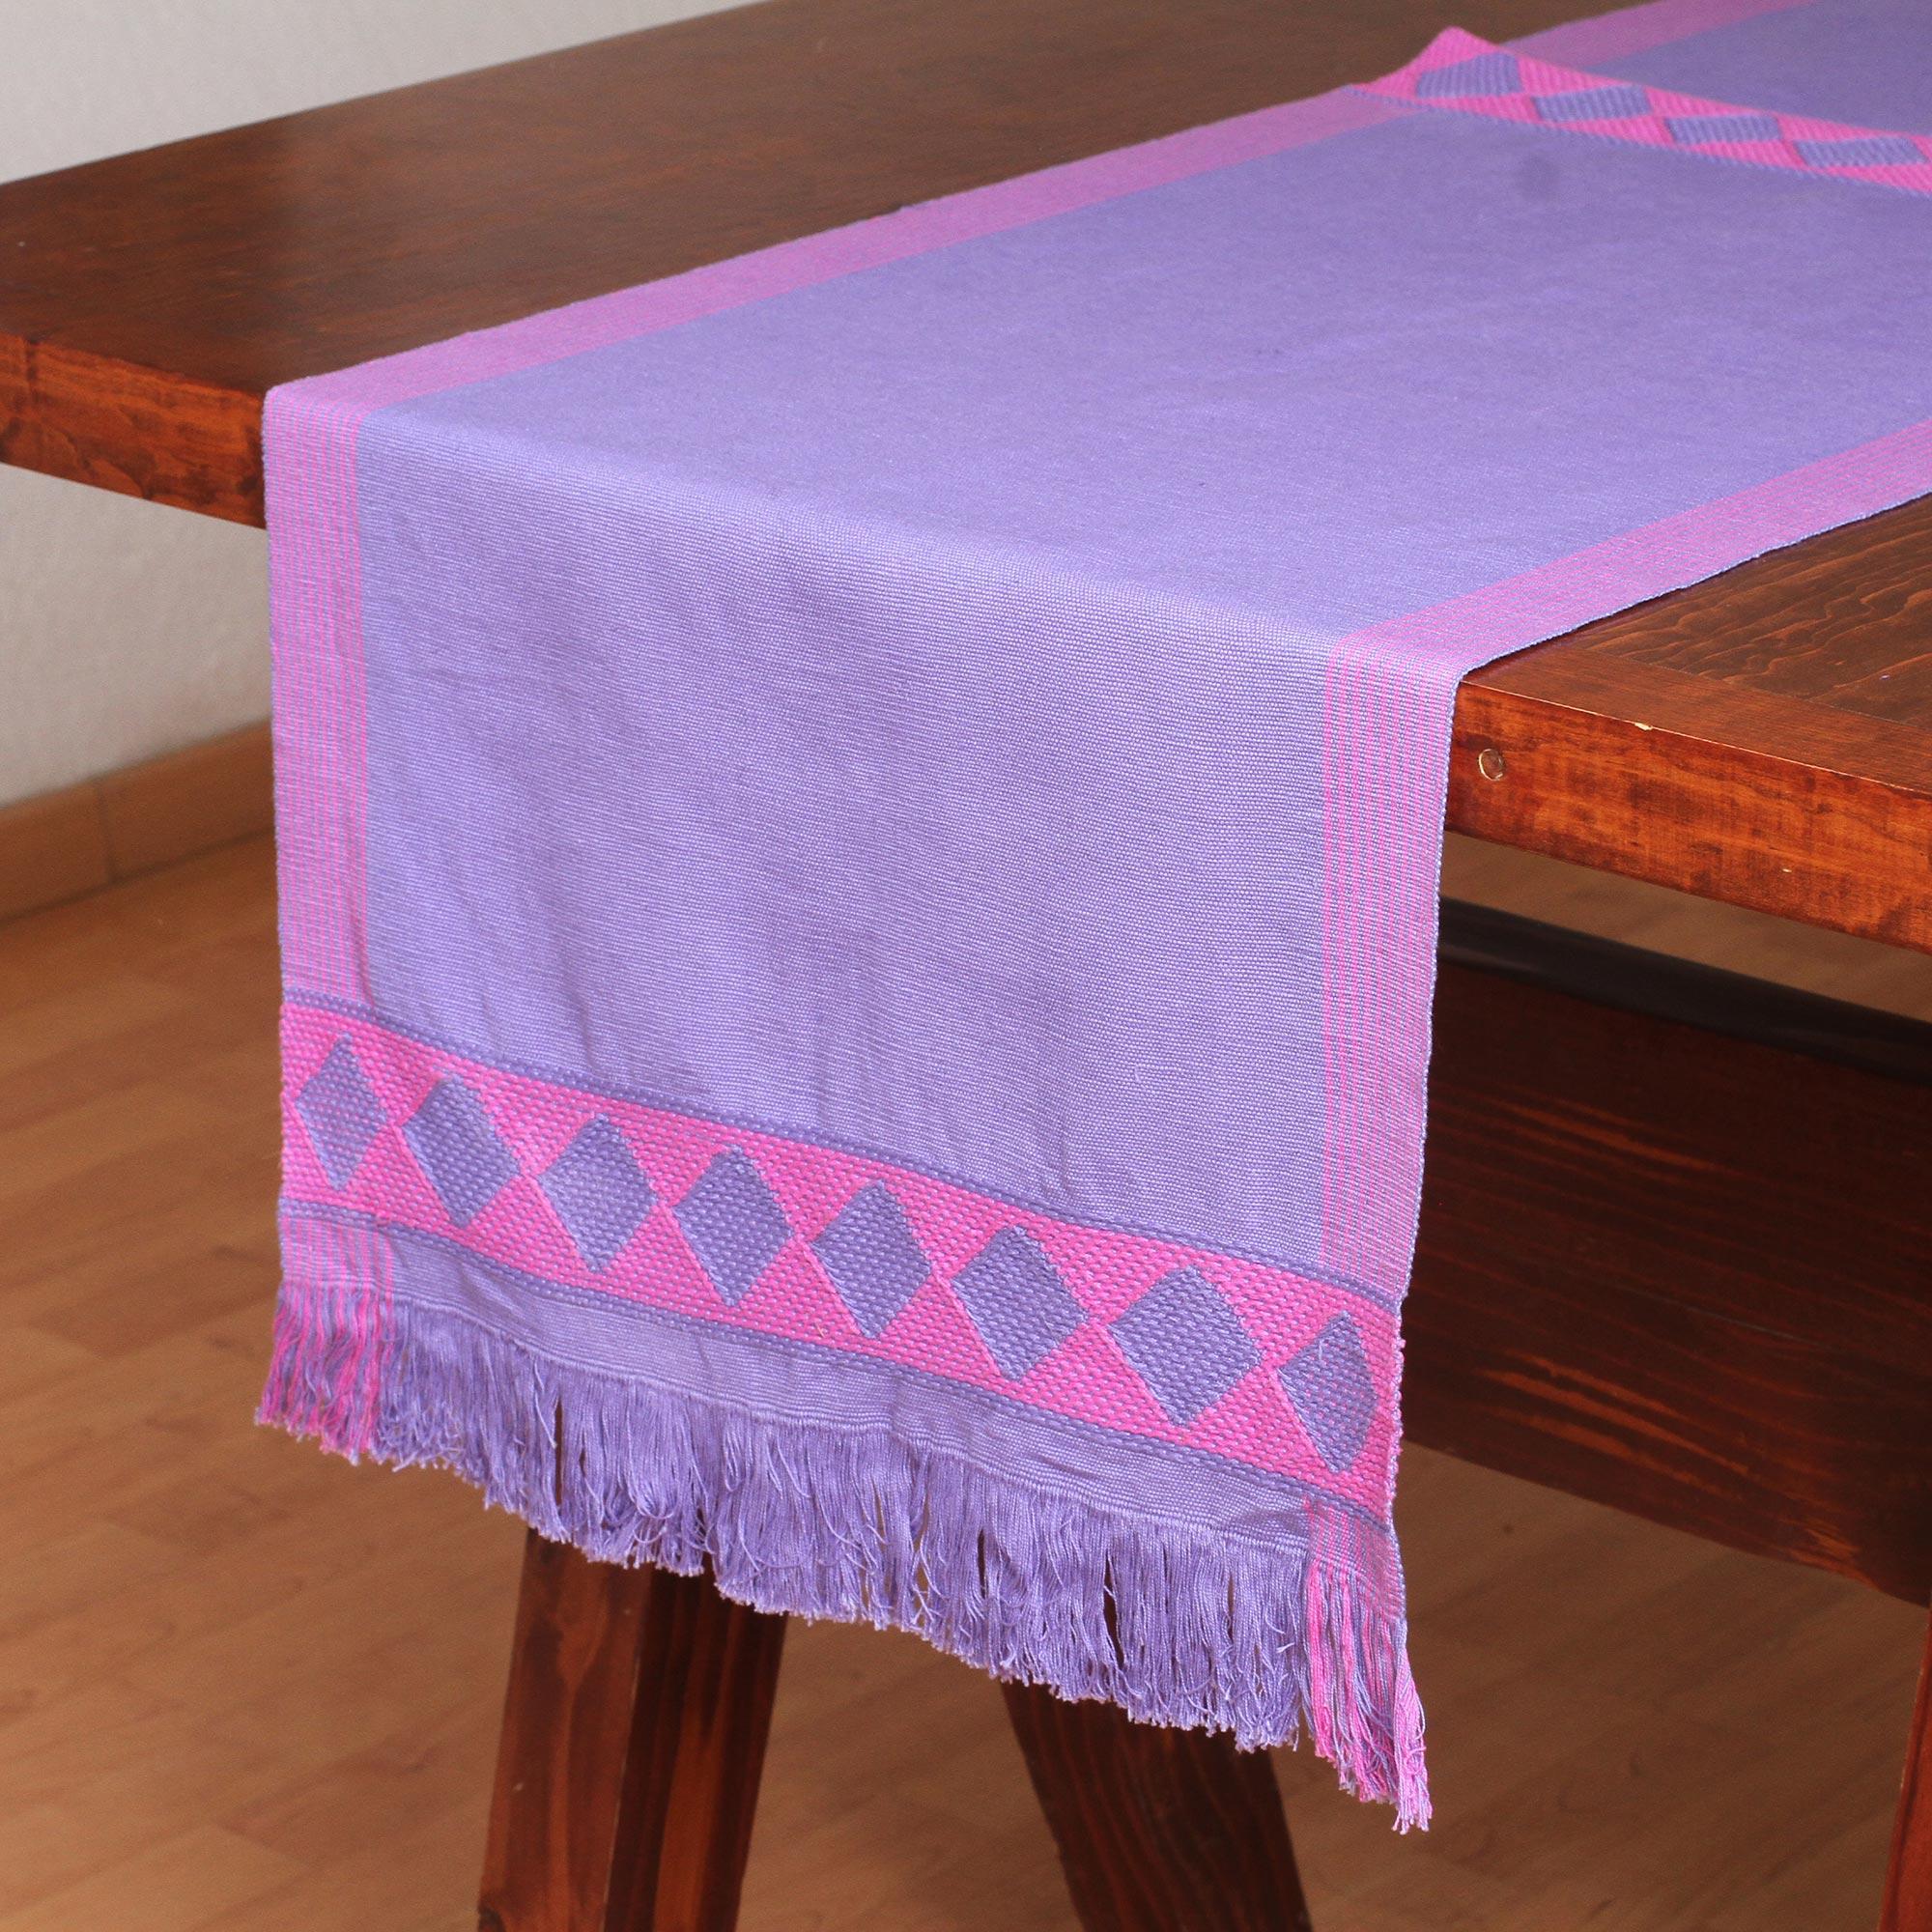 Geometric Cotton Table Runner In Purple From Mexico, U0027Festive Geometry In  Purpleu0027